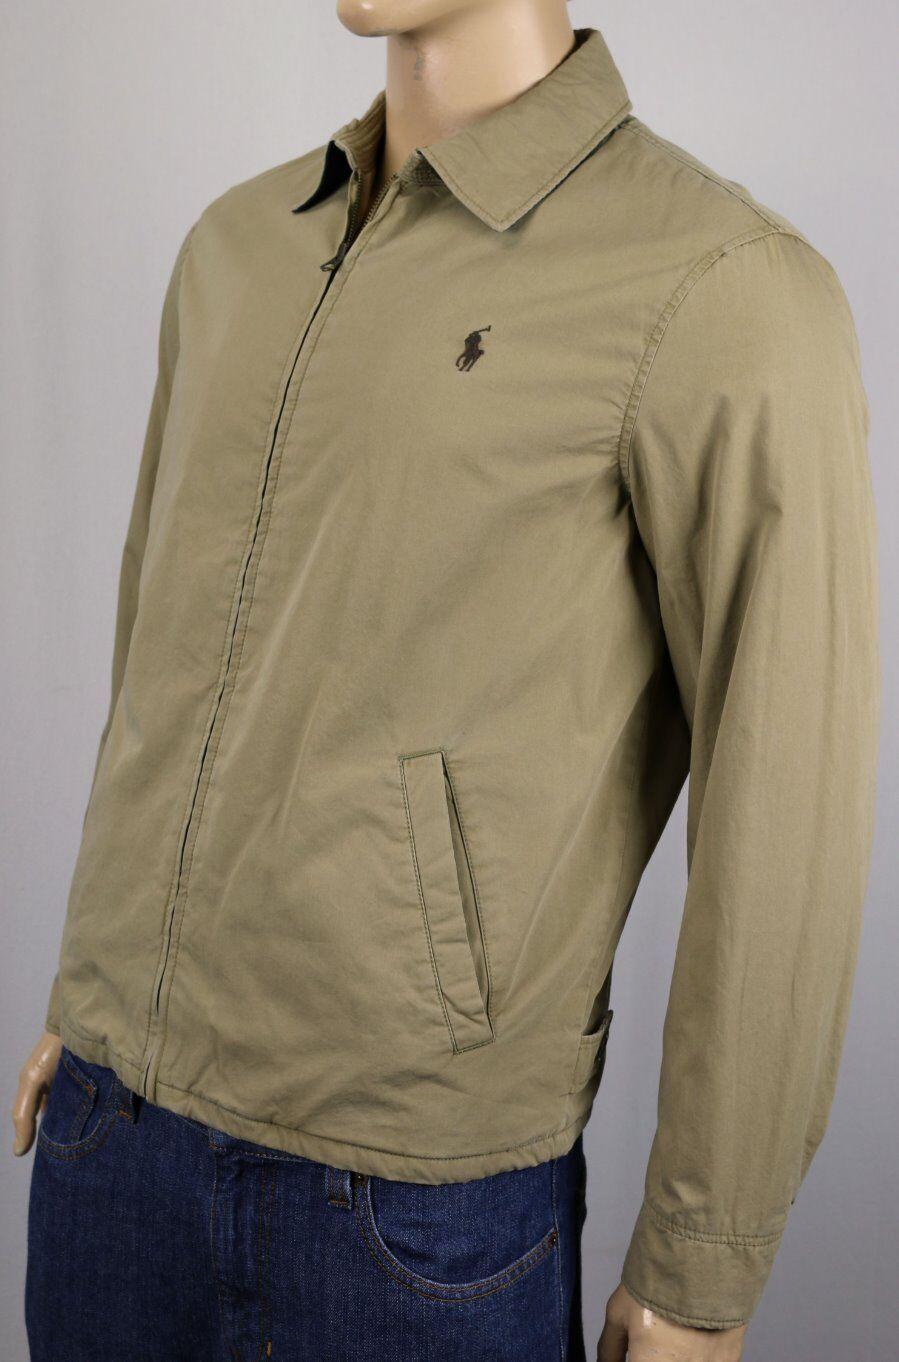 ee4e9ae4c Polo Ralph Lauren Khaki Jacket Coat Brown Pony NWT $165